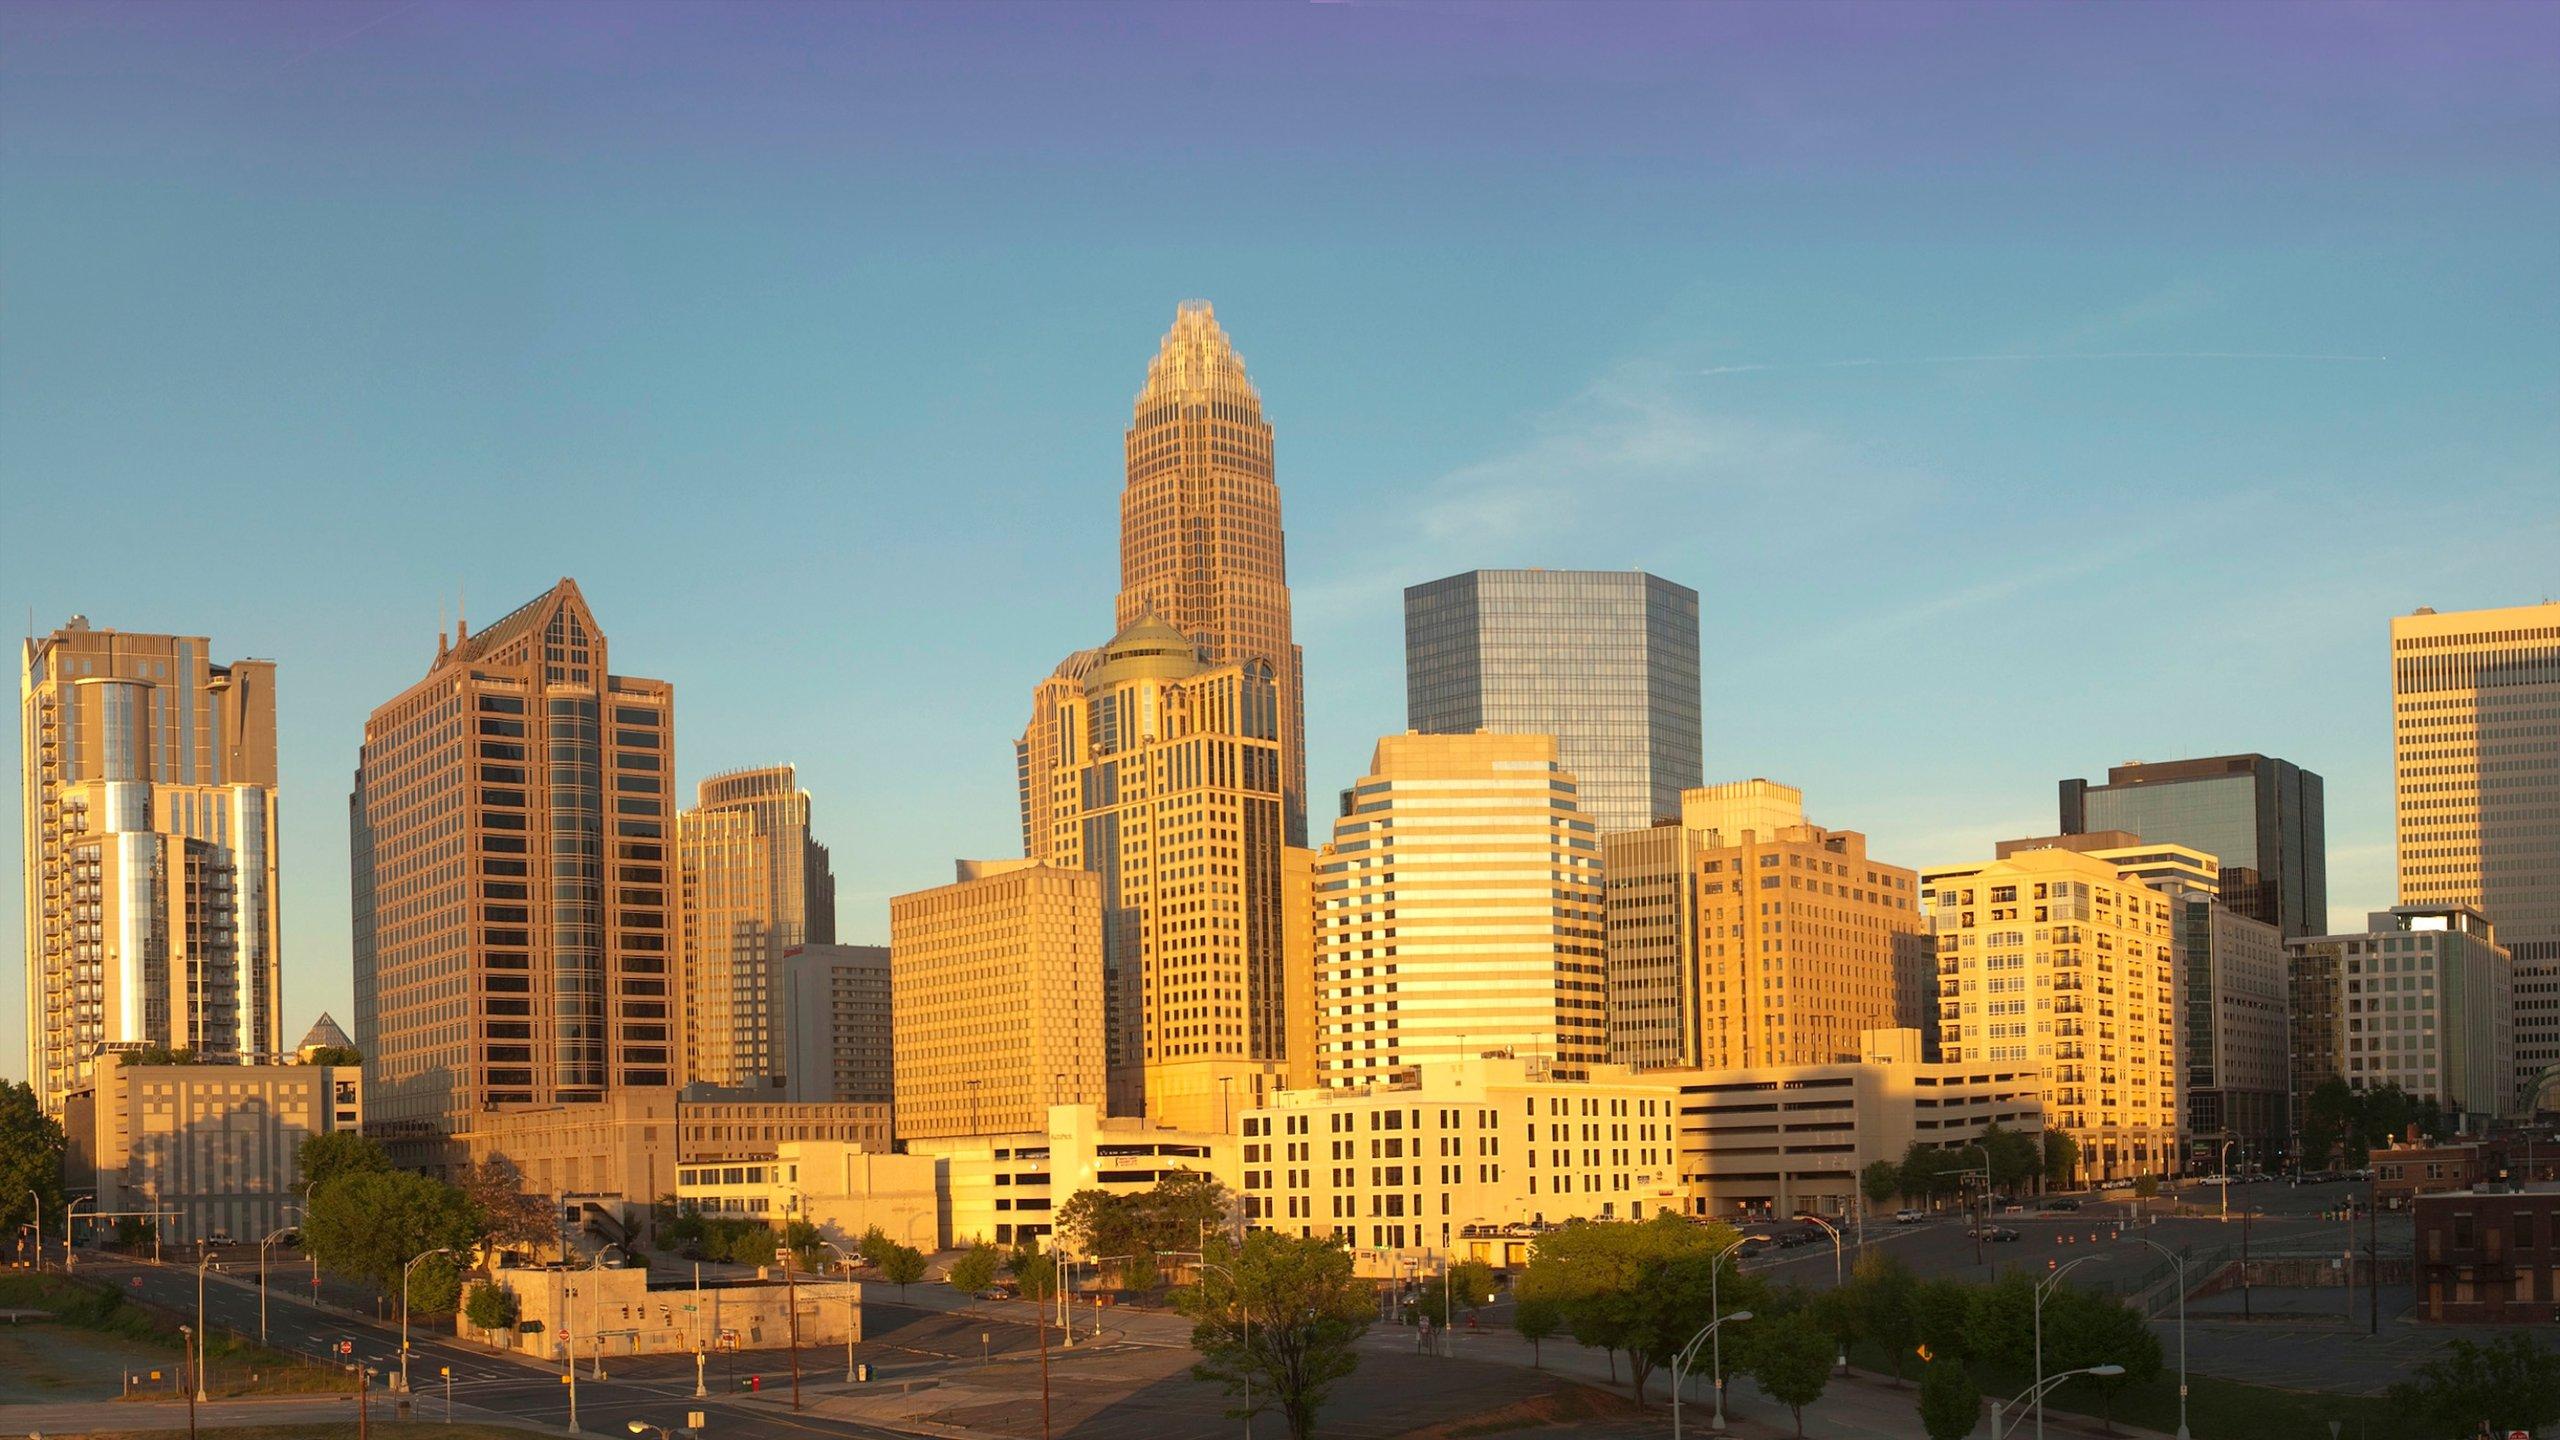 10 Best Spas in Charlotte $67: Spa Hotels & Resorts in 2019